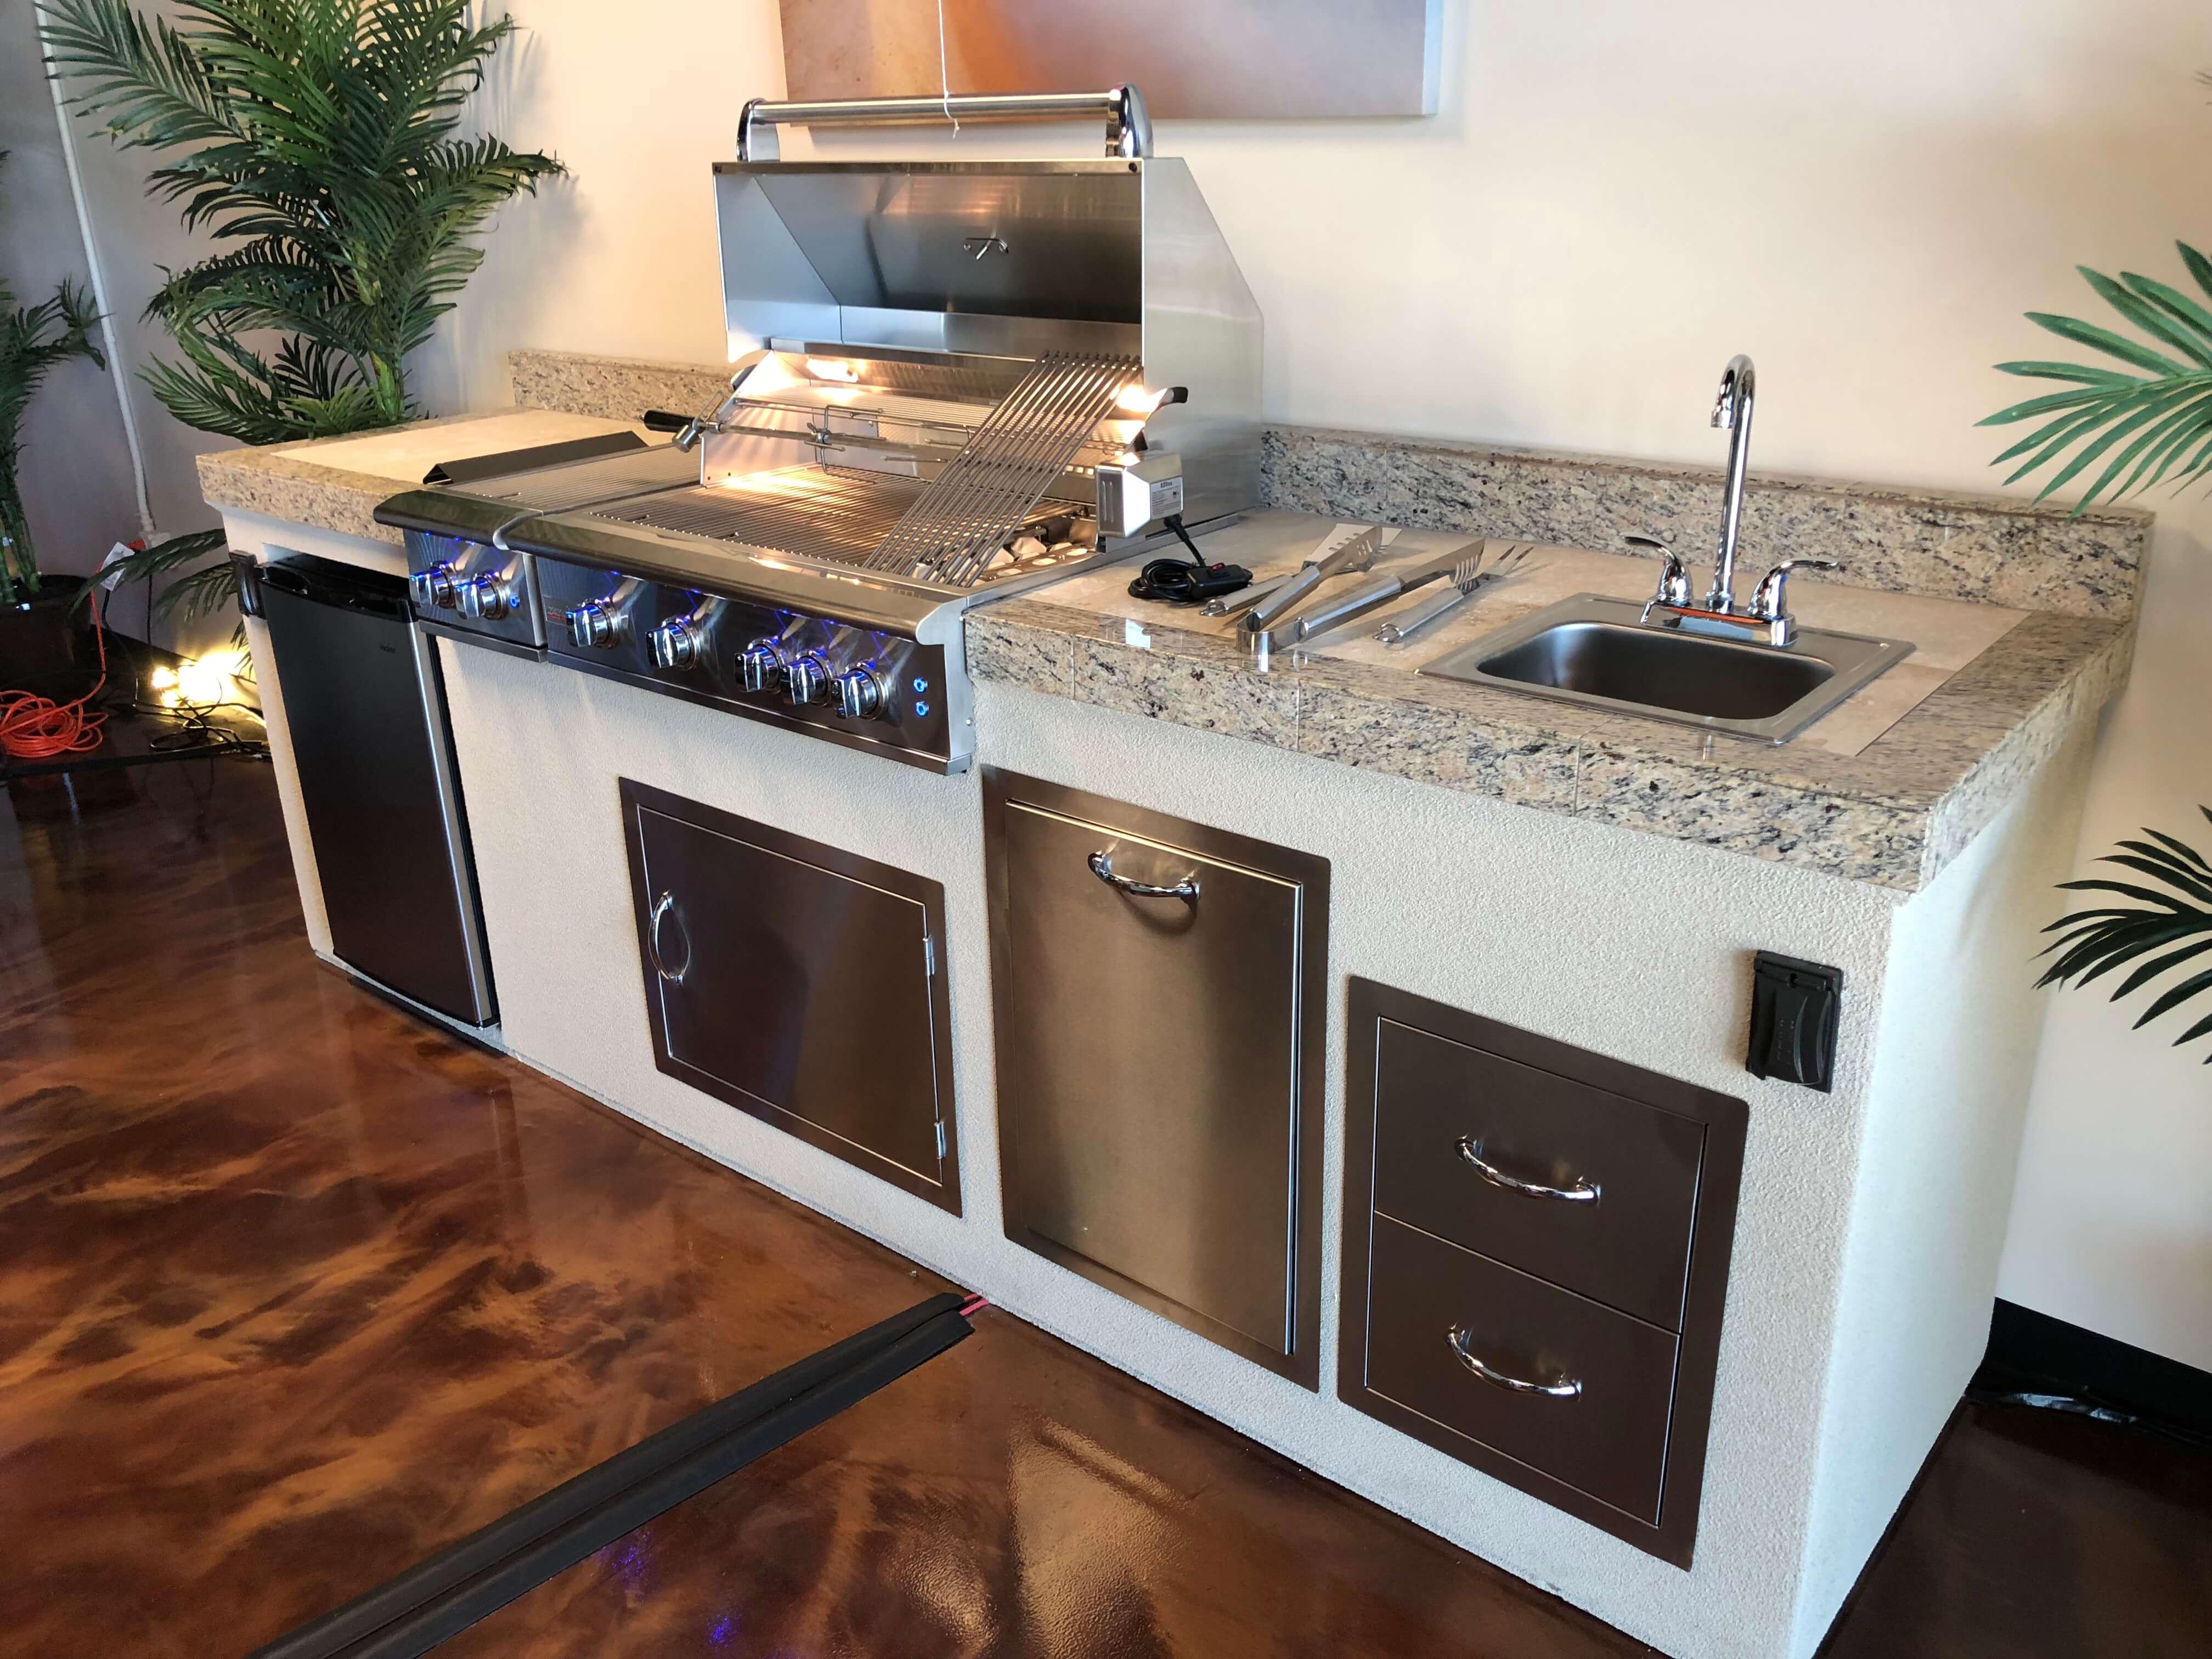 outdoor kitchens pictures backsplash tile ideas for kitchen paradise grills direct windermere showroom new